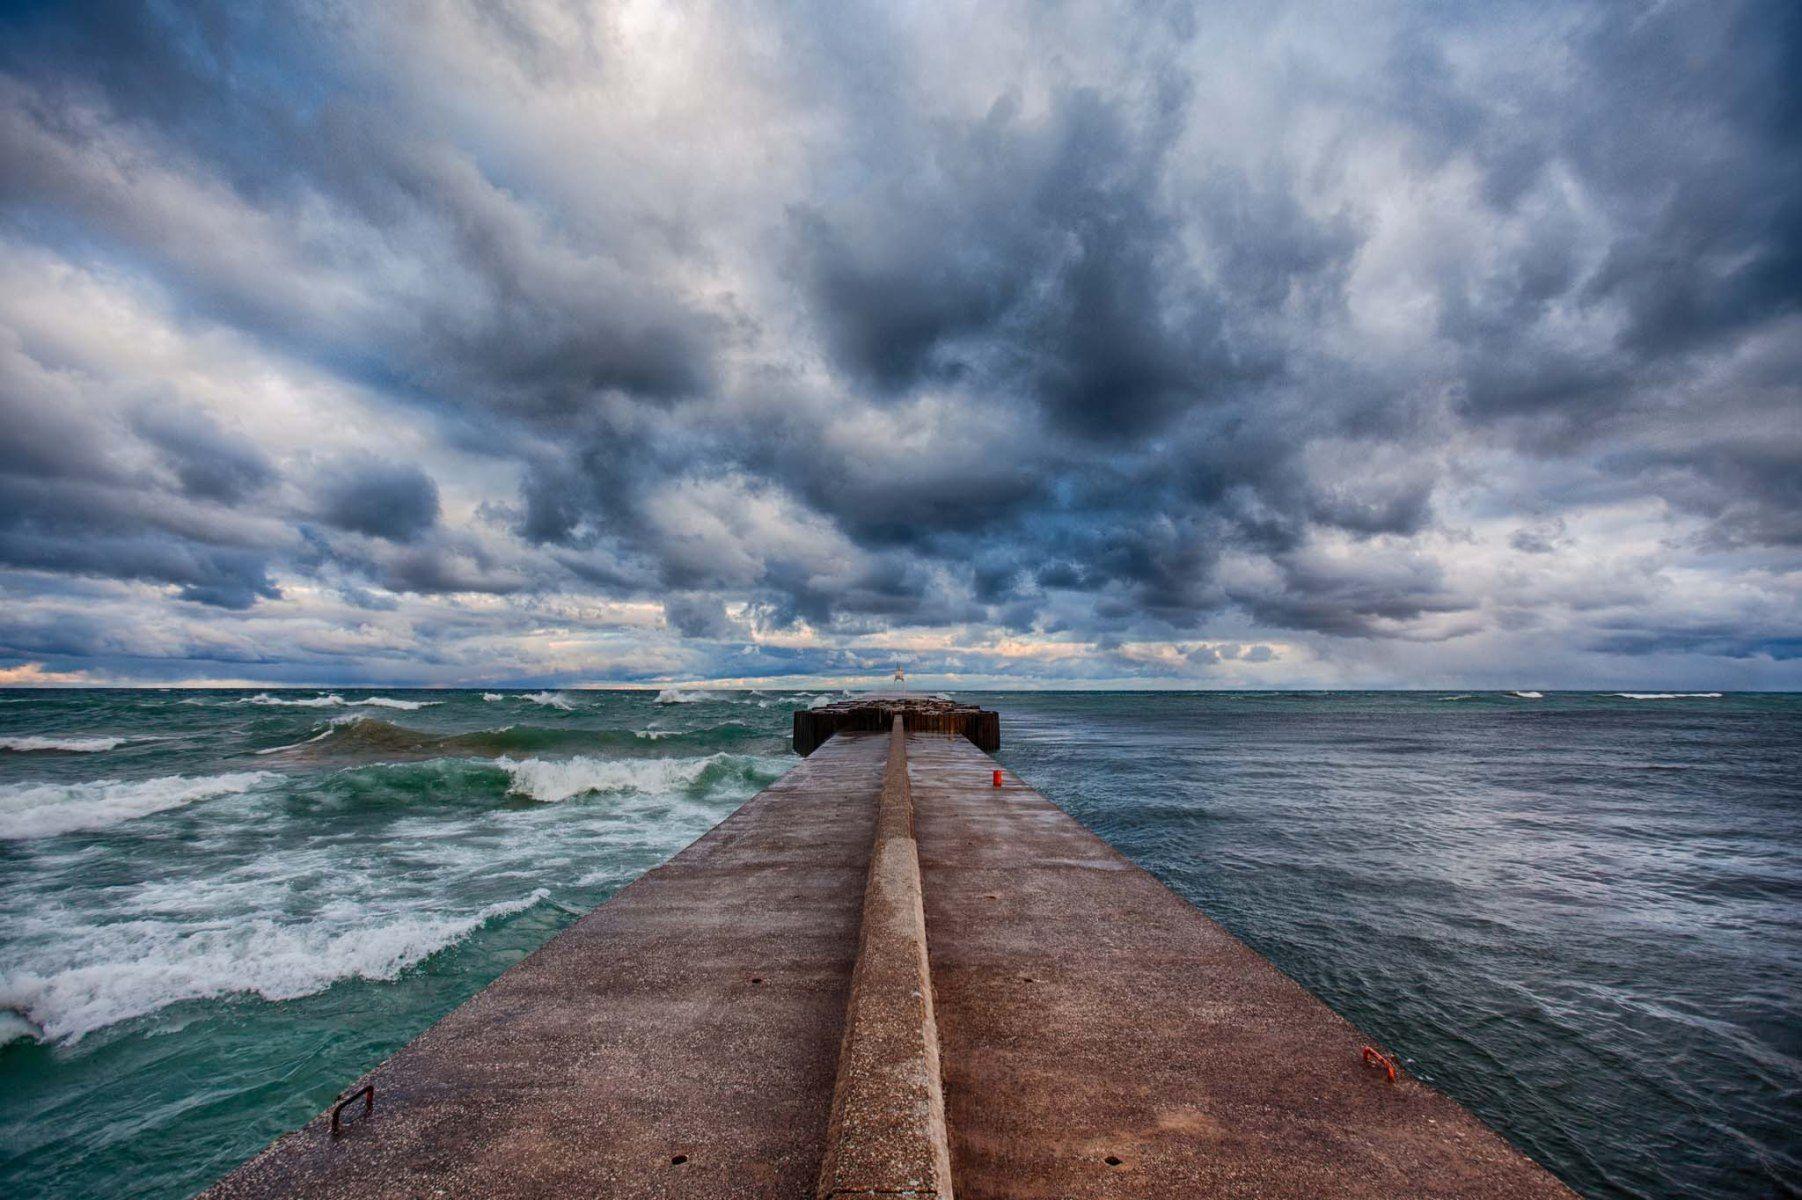 Beautiful Hd Sea Wallpaper Wallpapers Pinterest Nature